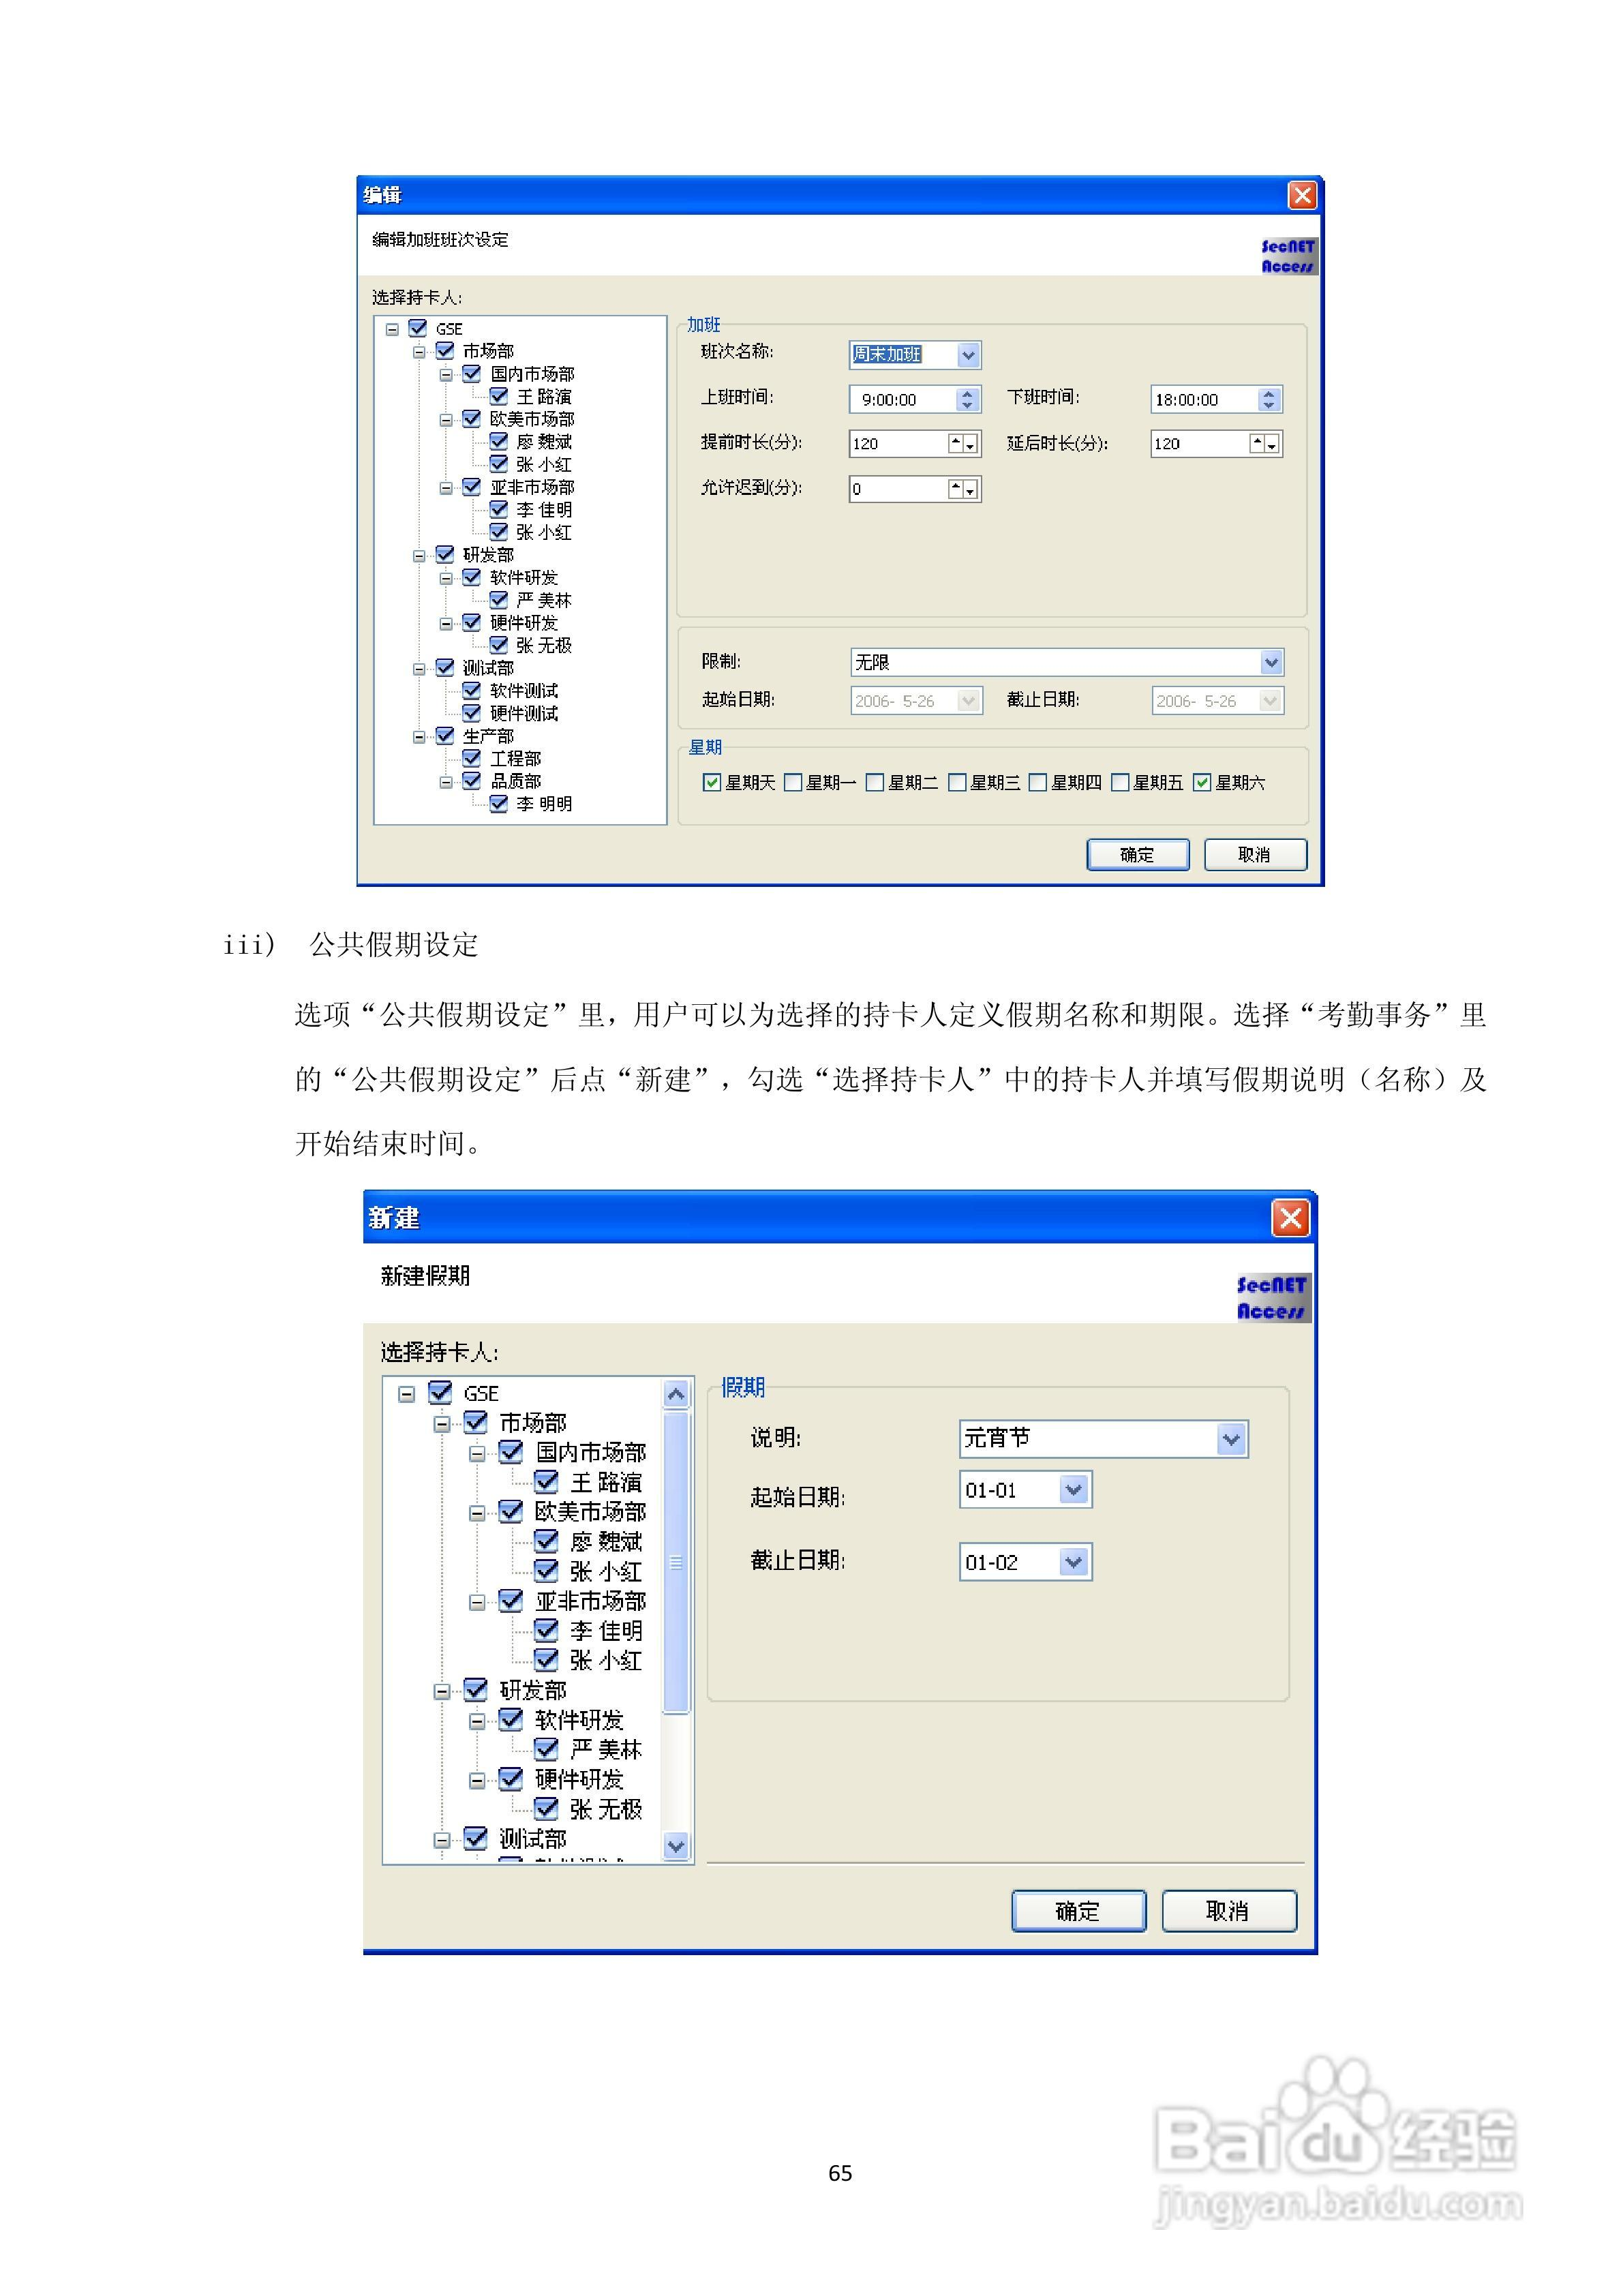 uspsecnet网络门禁管理软件使用说明书:[7